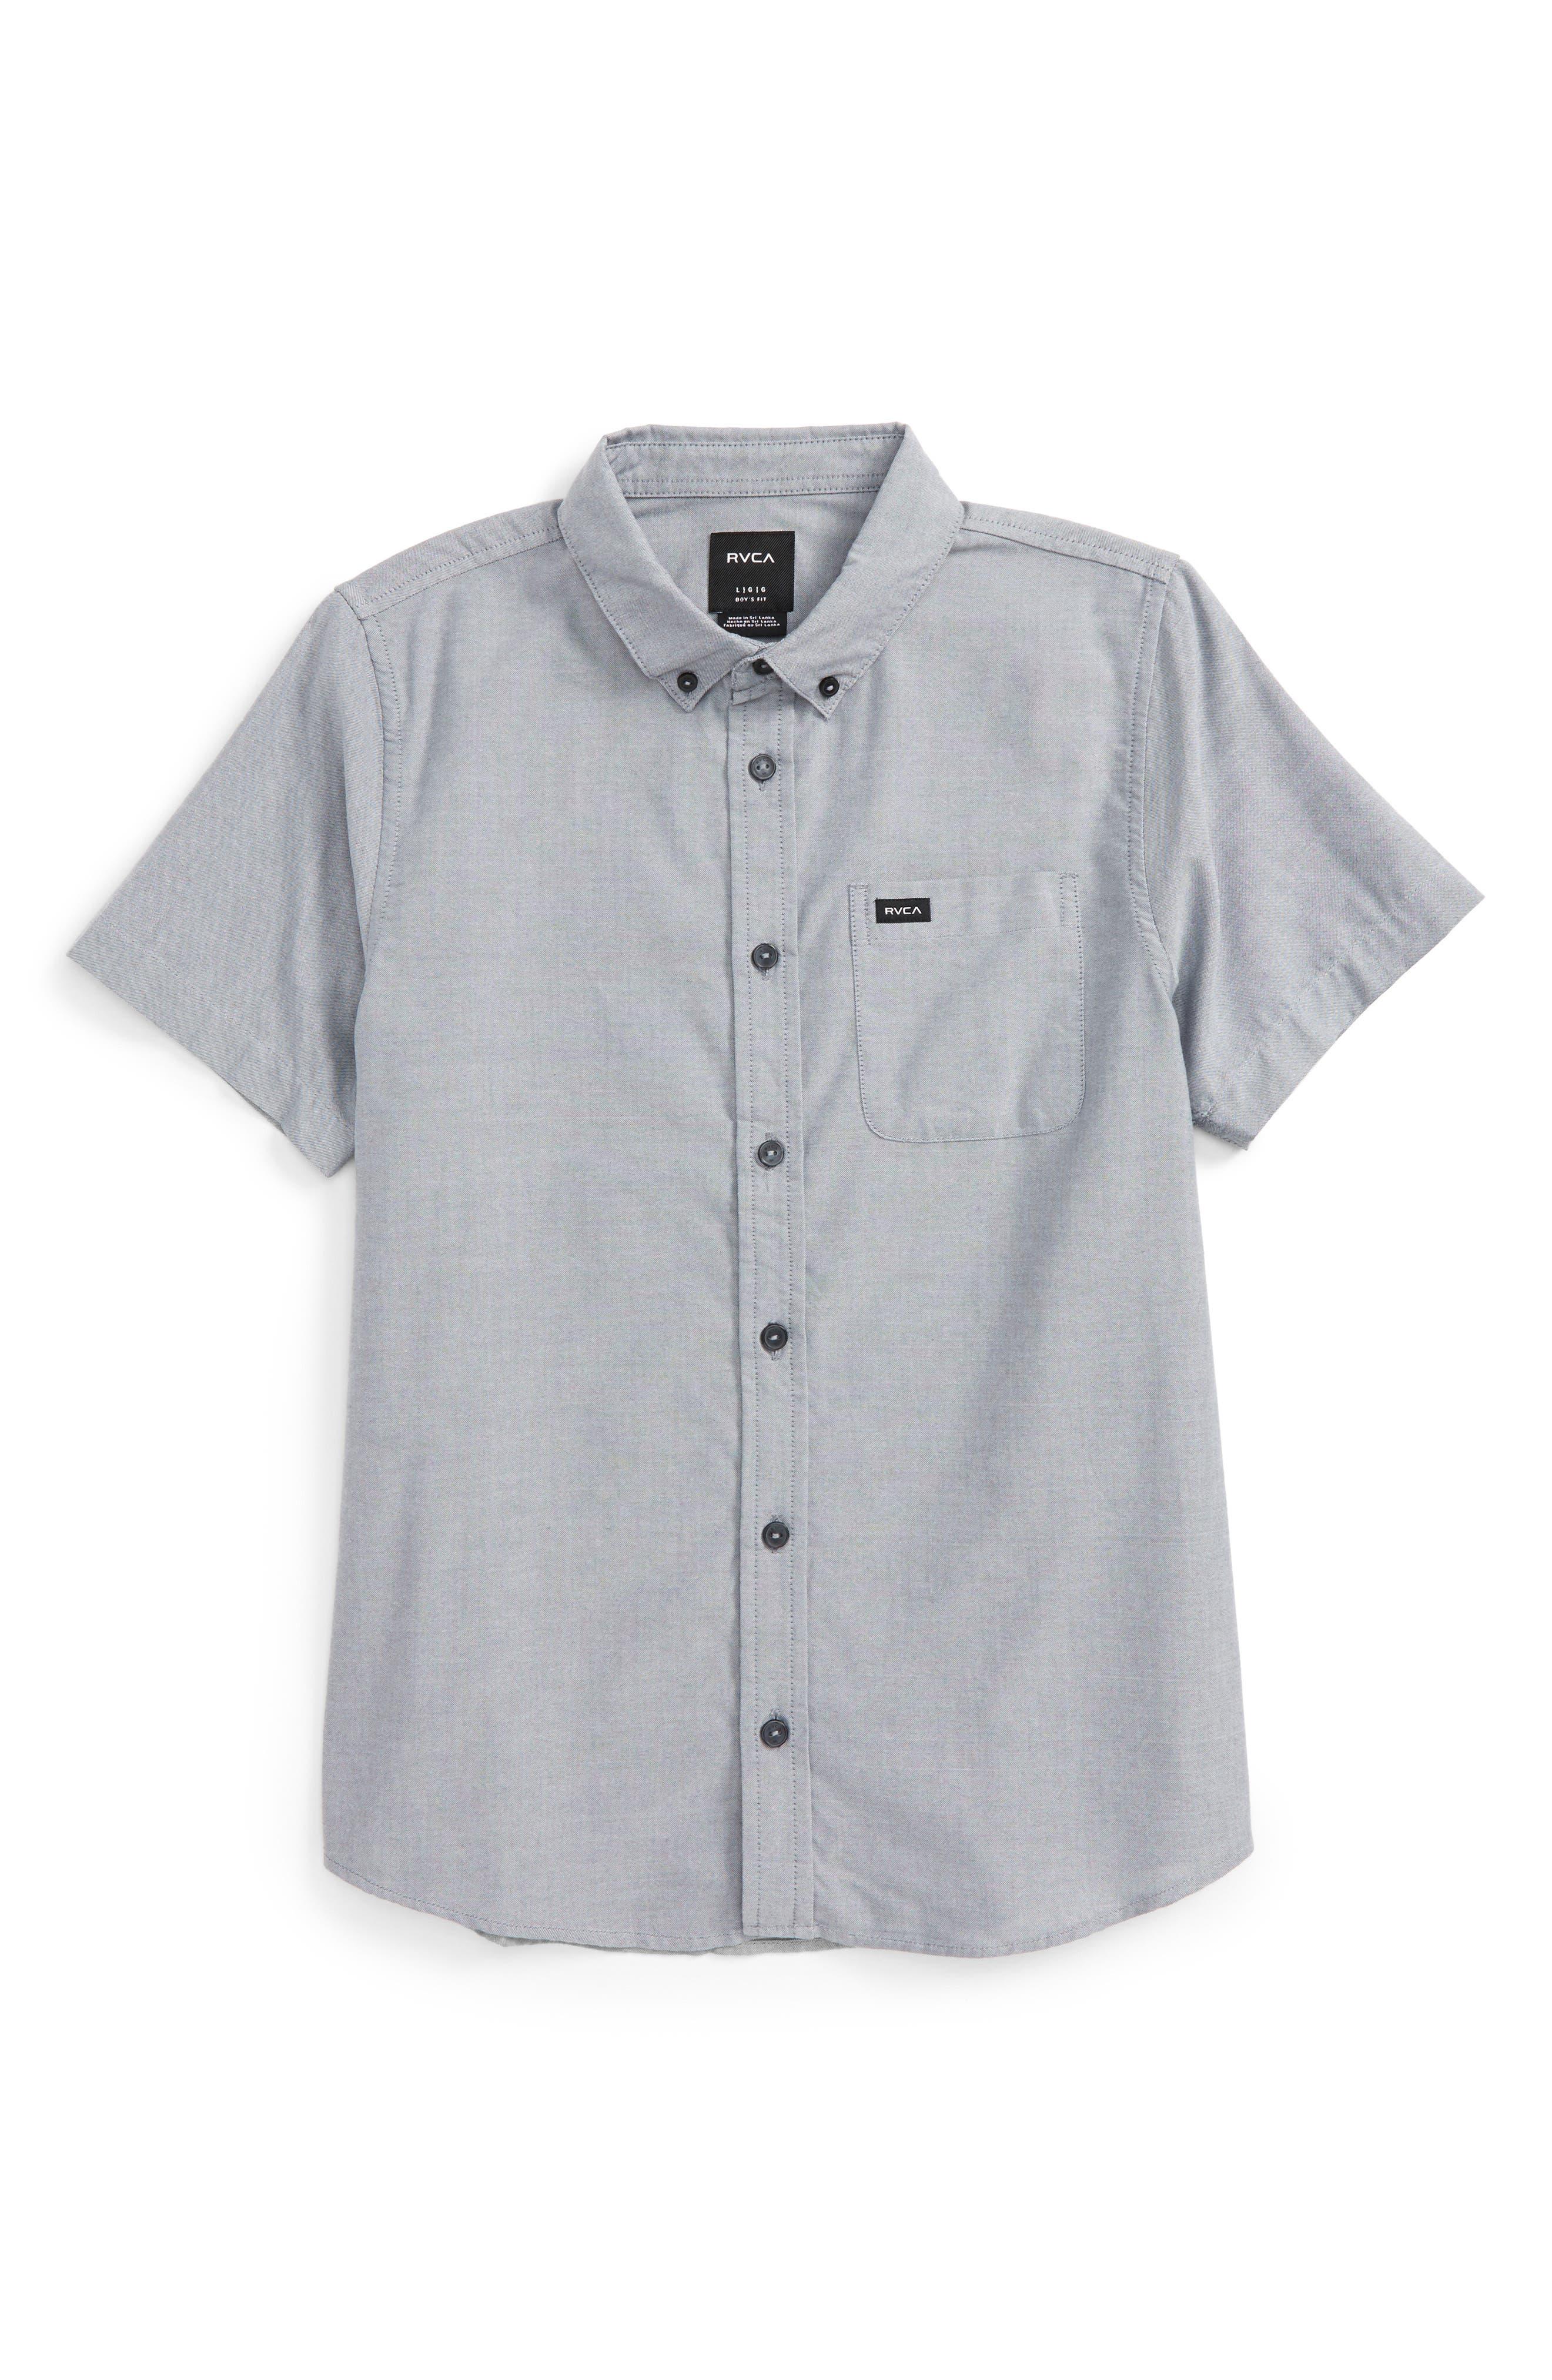 'That'll Do' Woven Shirt,                             Main thumbnail 1, color,                             Pavement